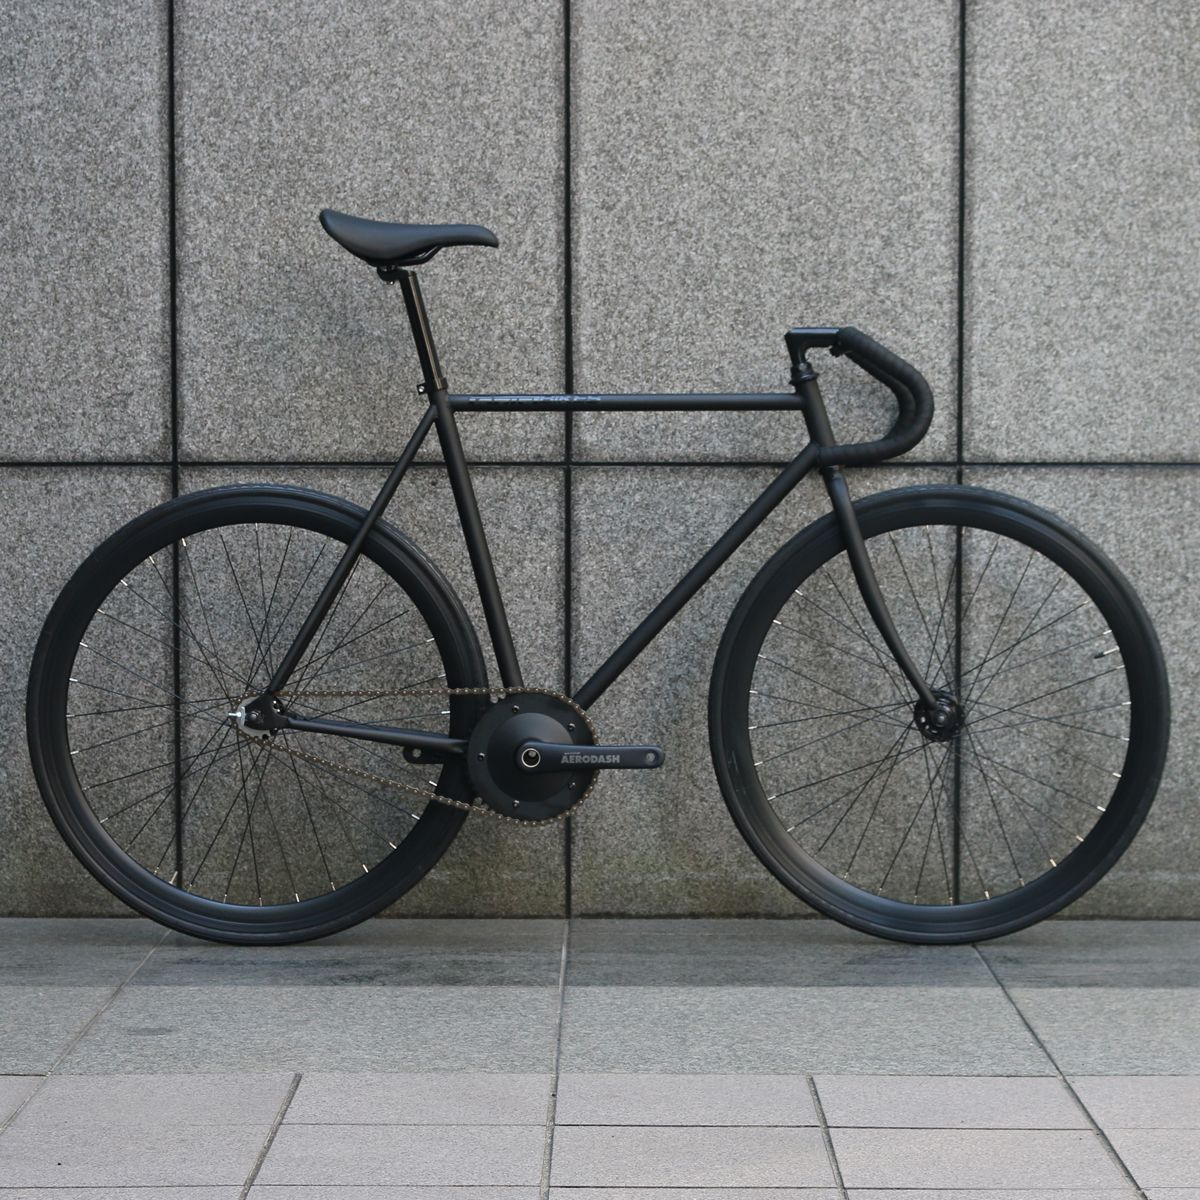 【 SPECIAL PRICE 】ピストバイク 完成車 CARTEL BIKES AVENUE MAT BLACK ERODASH DIRECT CRANKSET CUSTOM